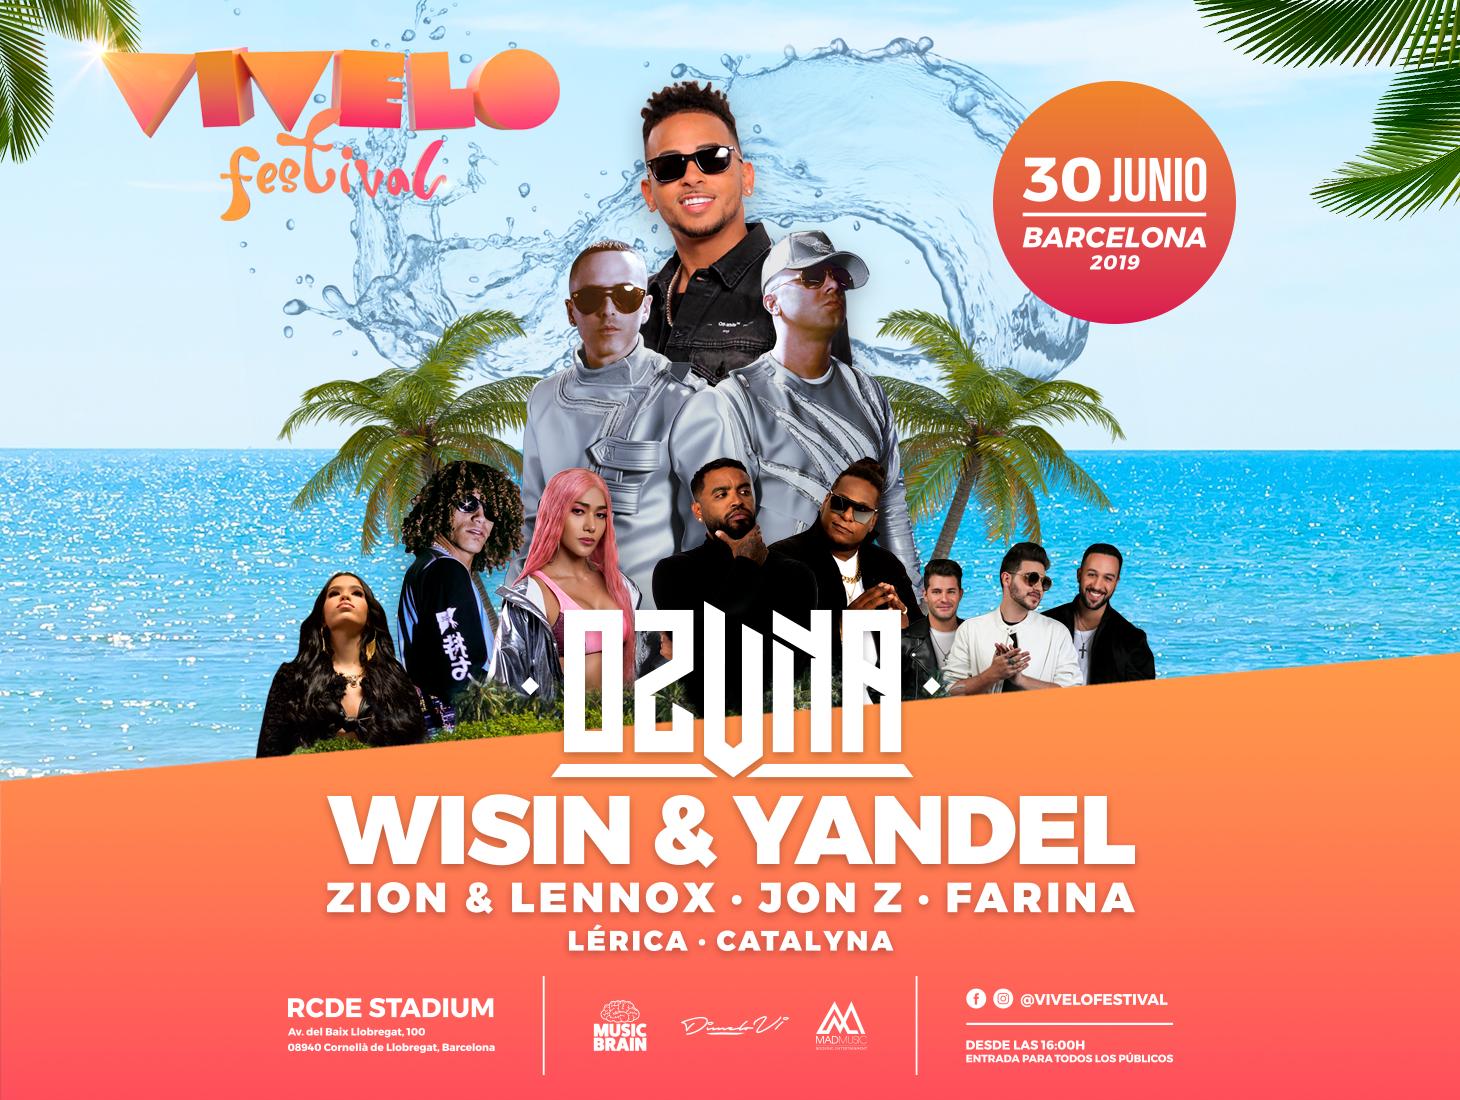 vivelo-festival-2019-5cbed9a66d2e7.png